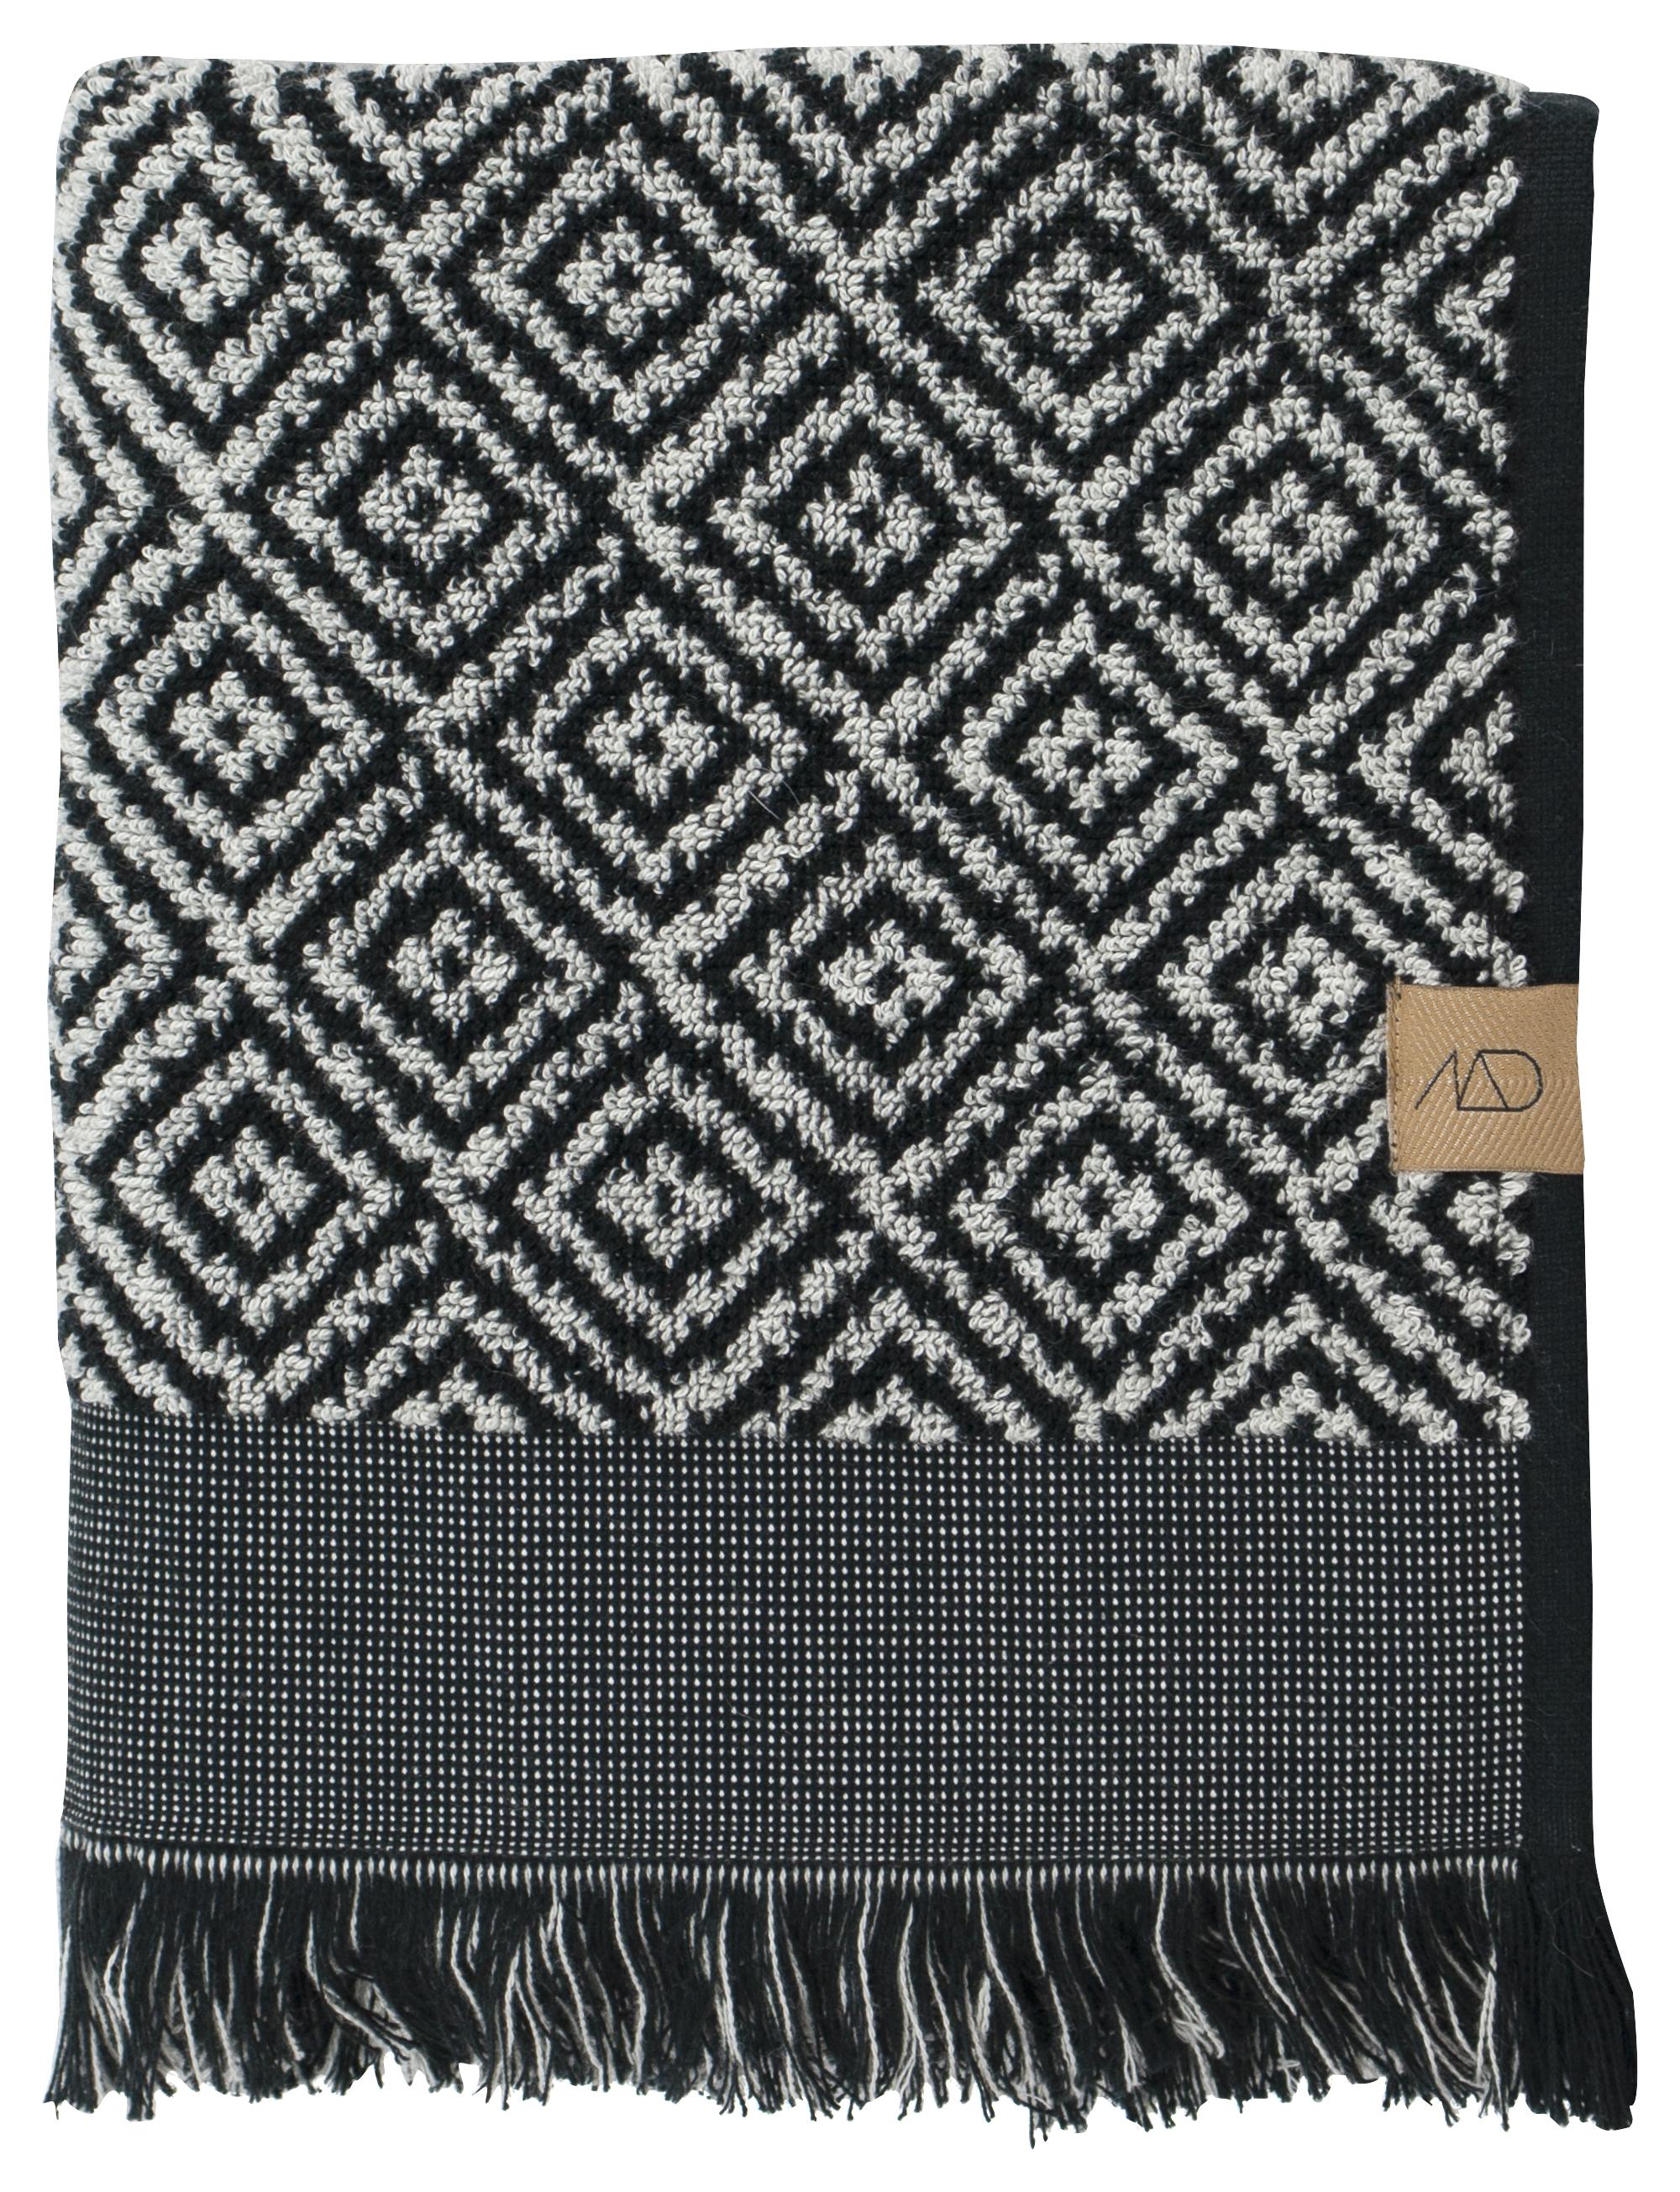 Mette Ditmer Morroco håndklæde, 35x60 cm, sort/hvid, 2 stk